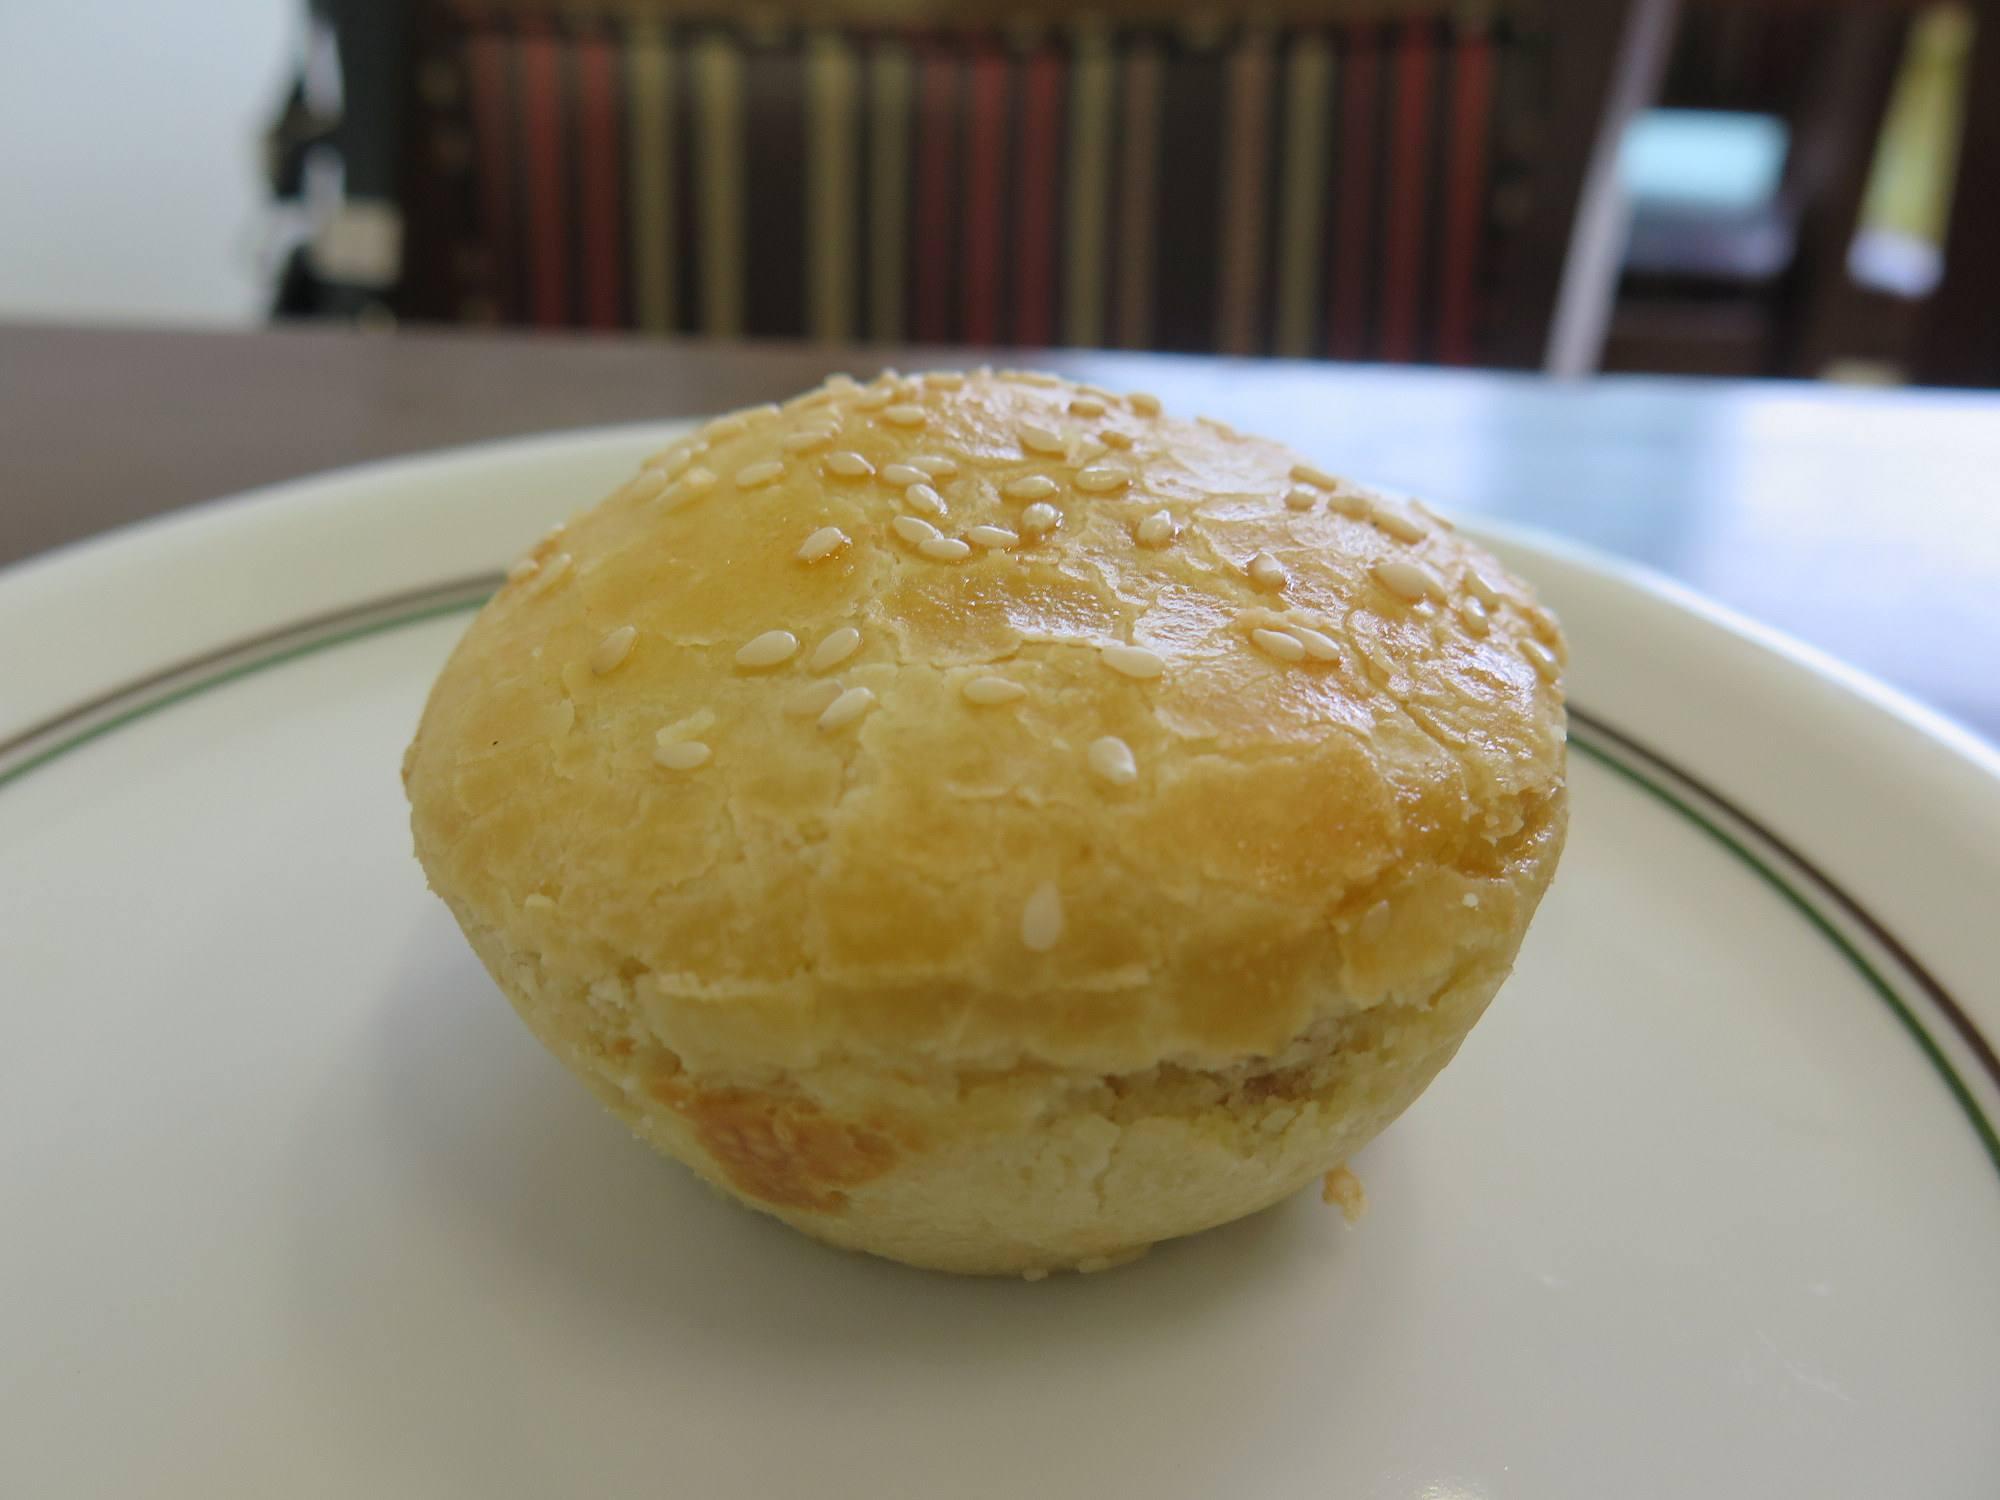 Close up of empadinha snack on plate